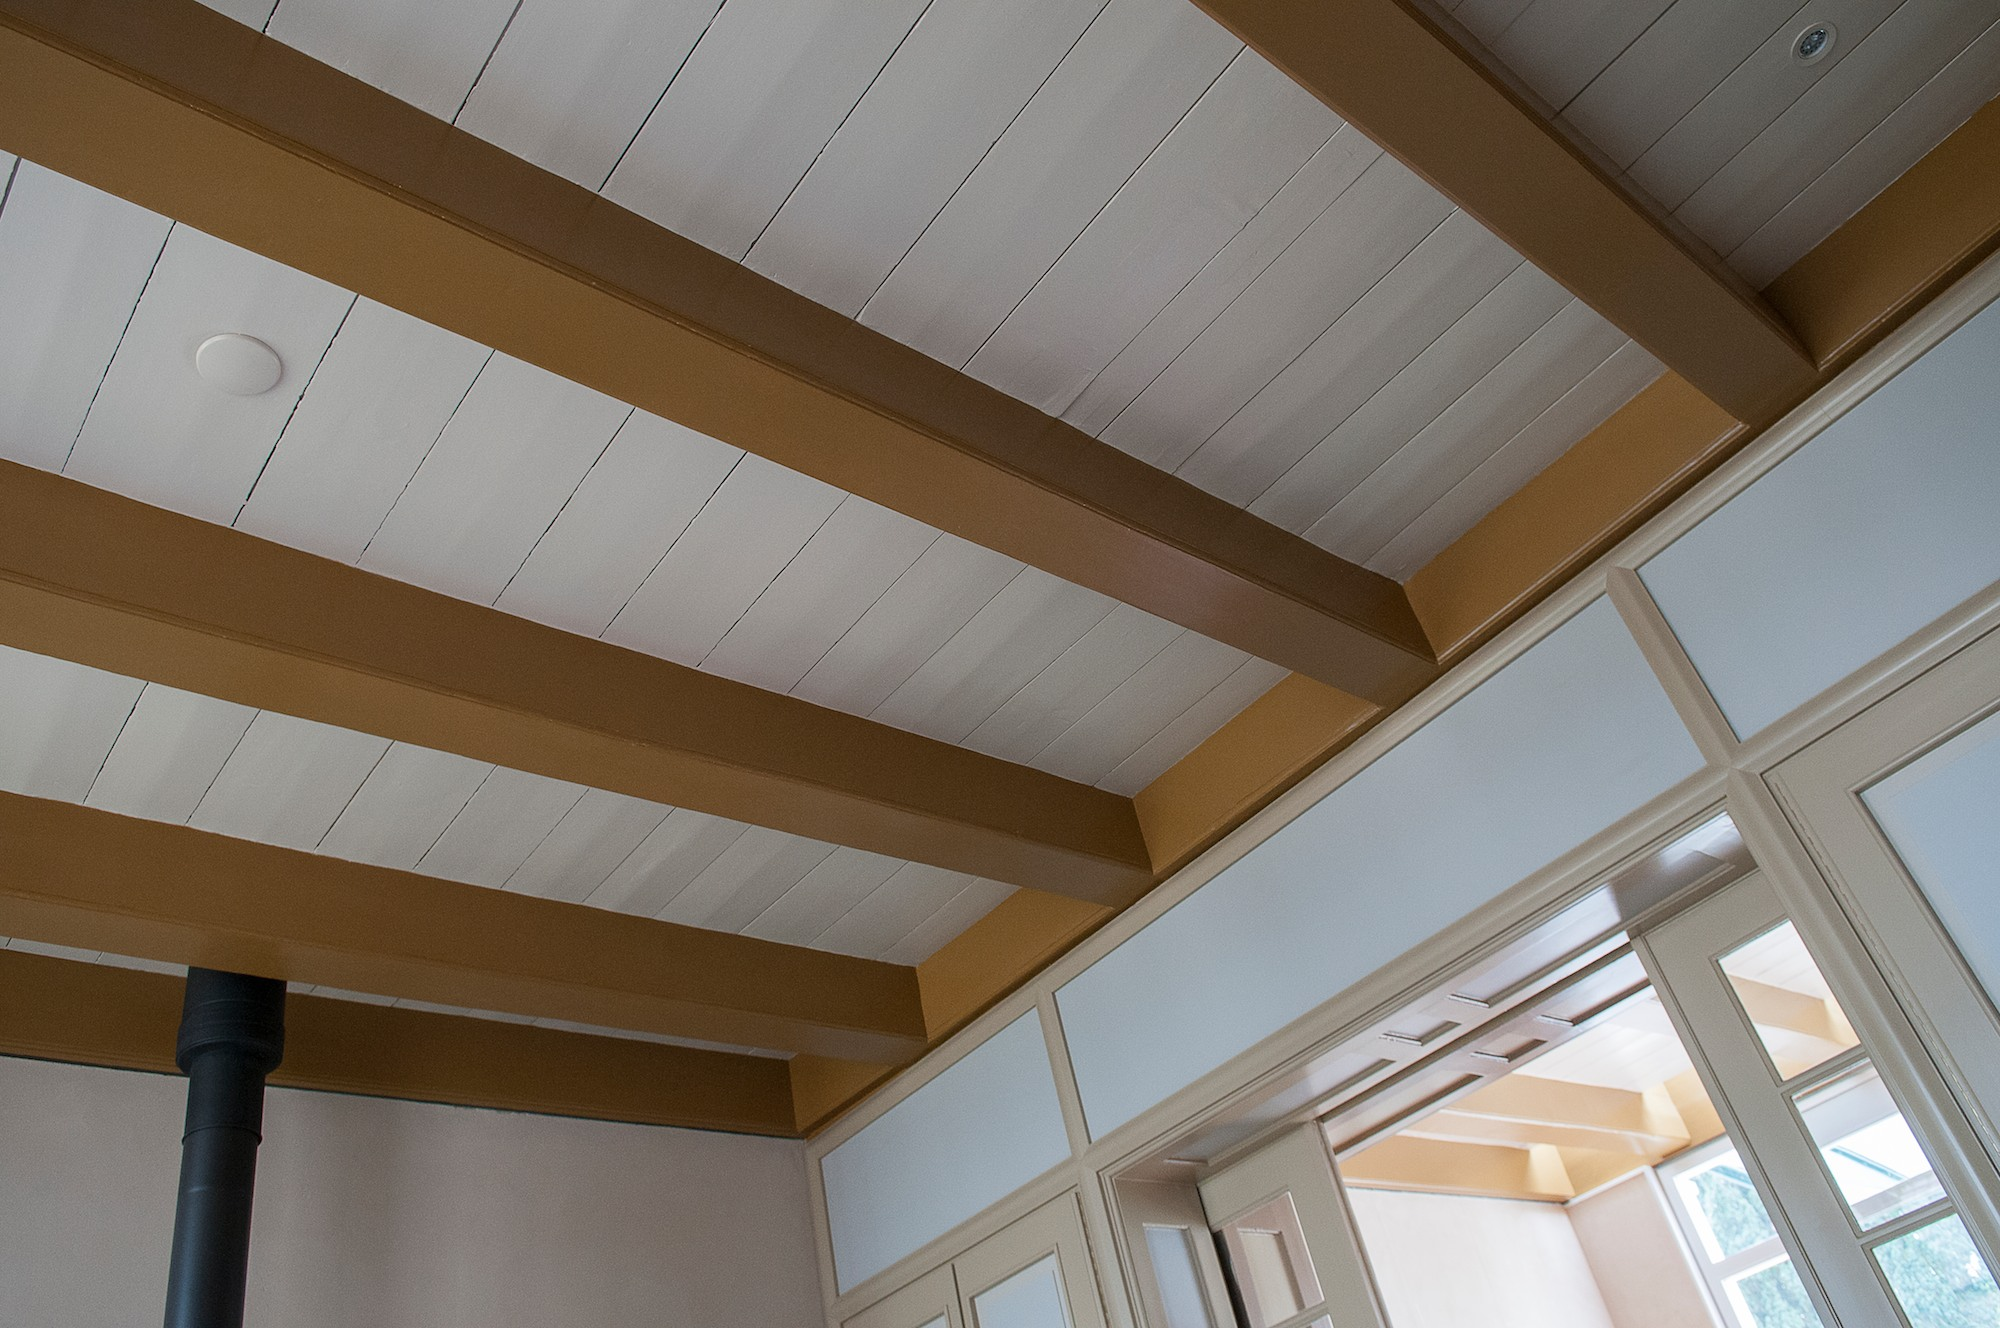 Soorten Plafonds Woonkamer